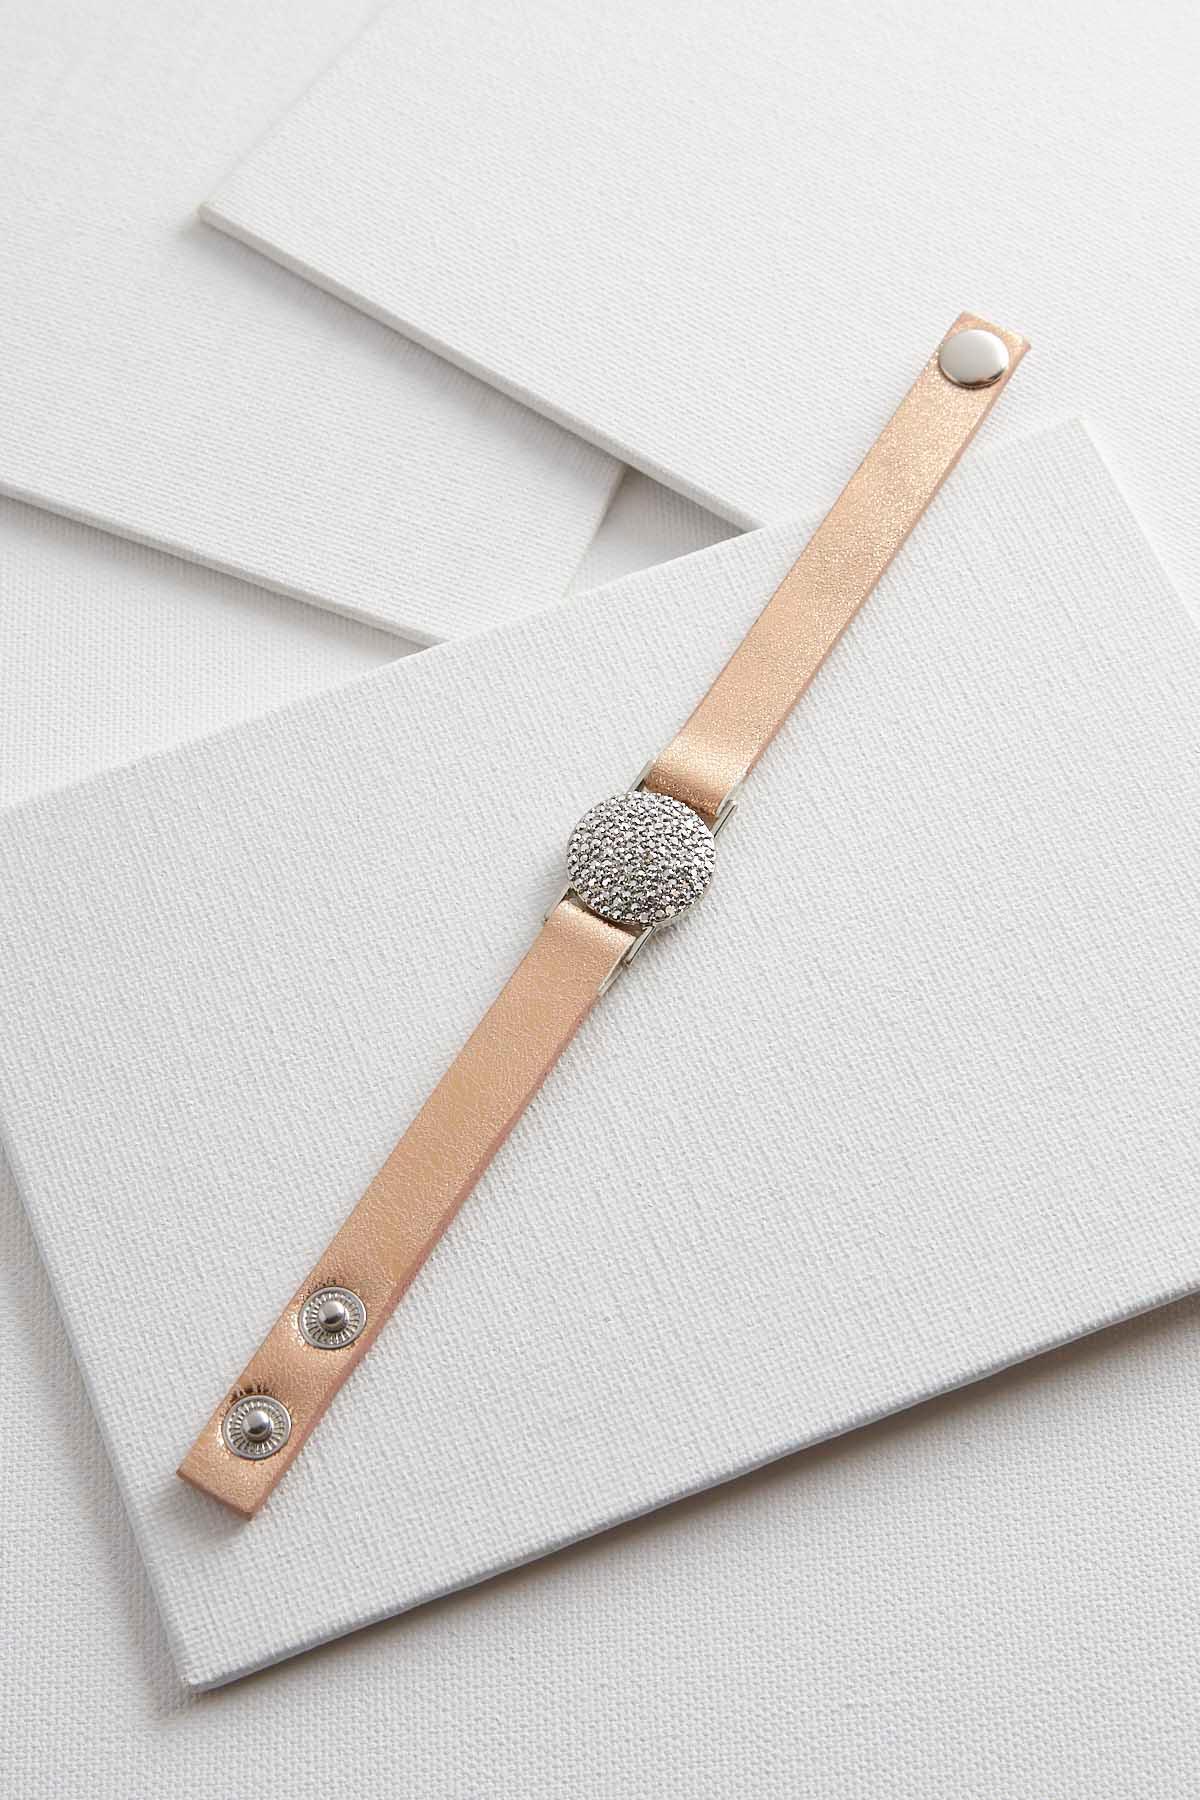 Pave Disk Faux Leather Bracelet